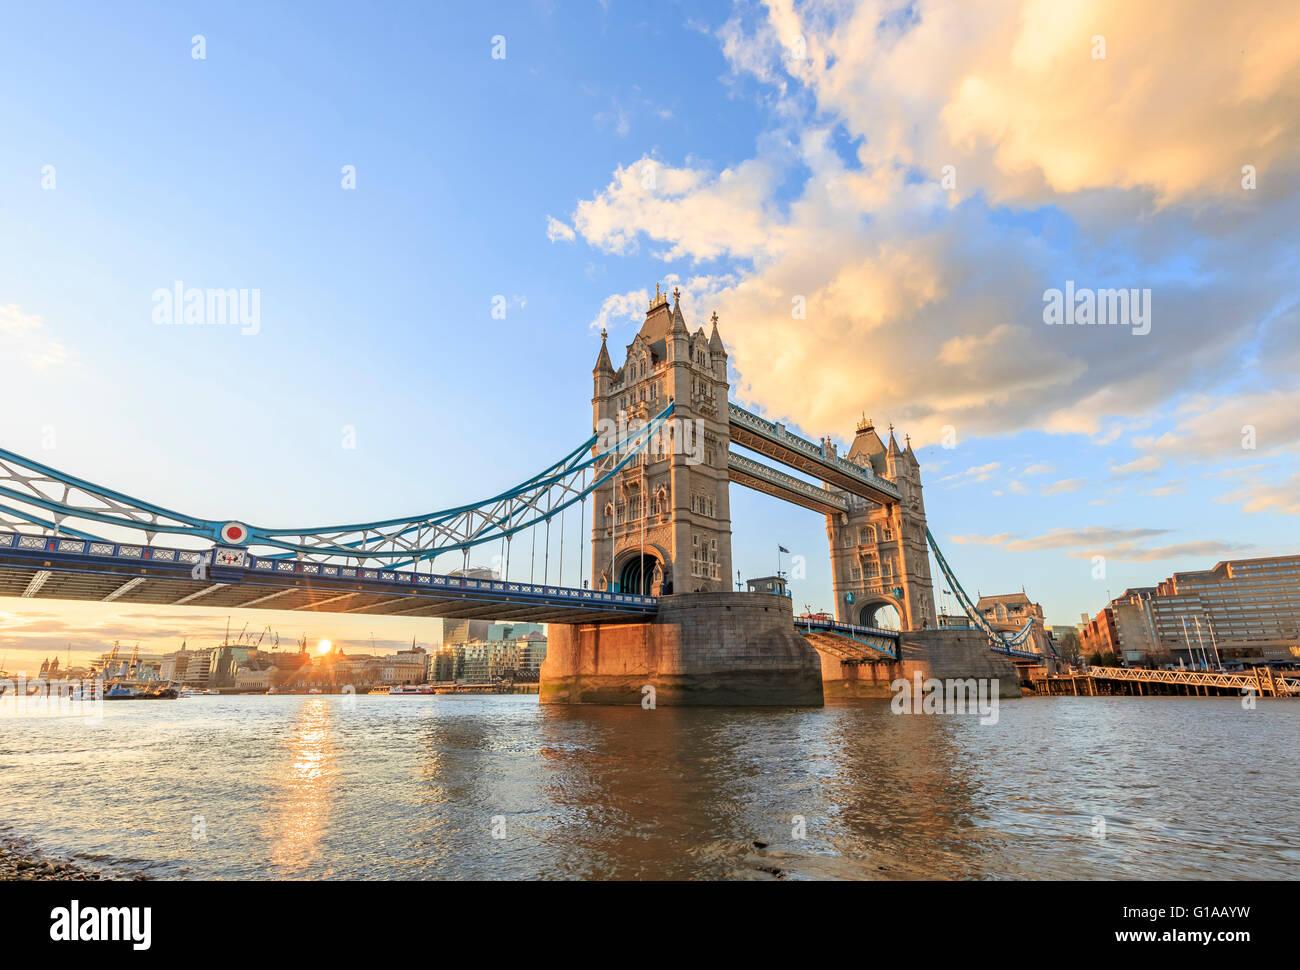 The famous Tower Bridge at London, United Kingdom - Stock Image